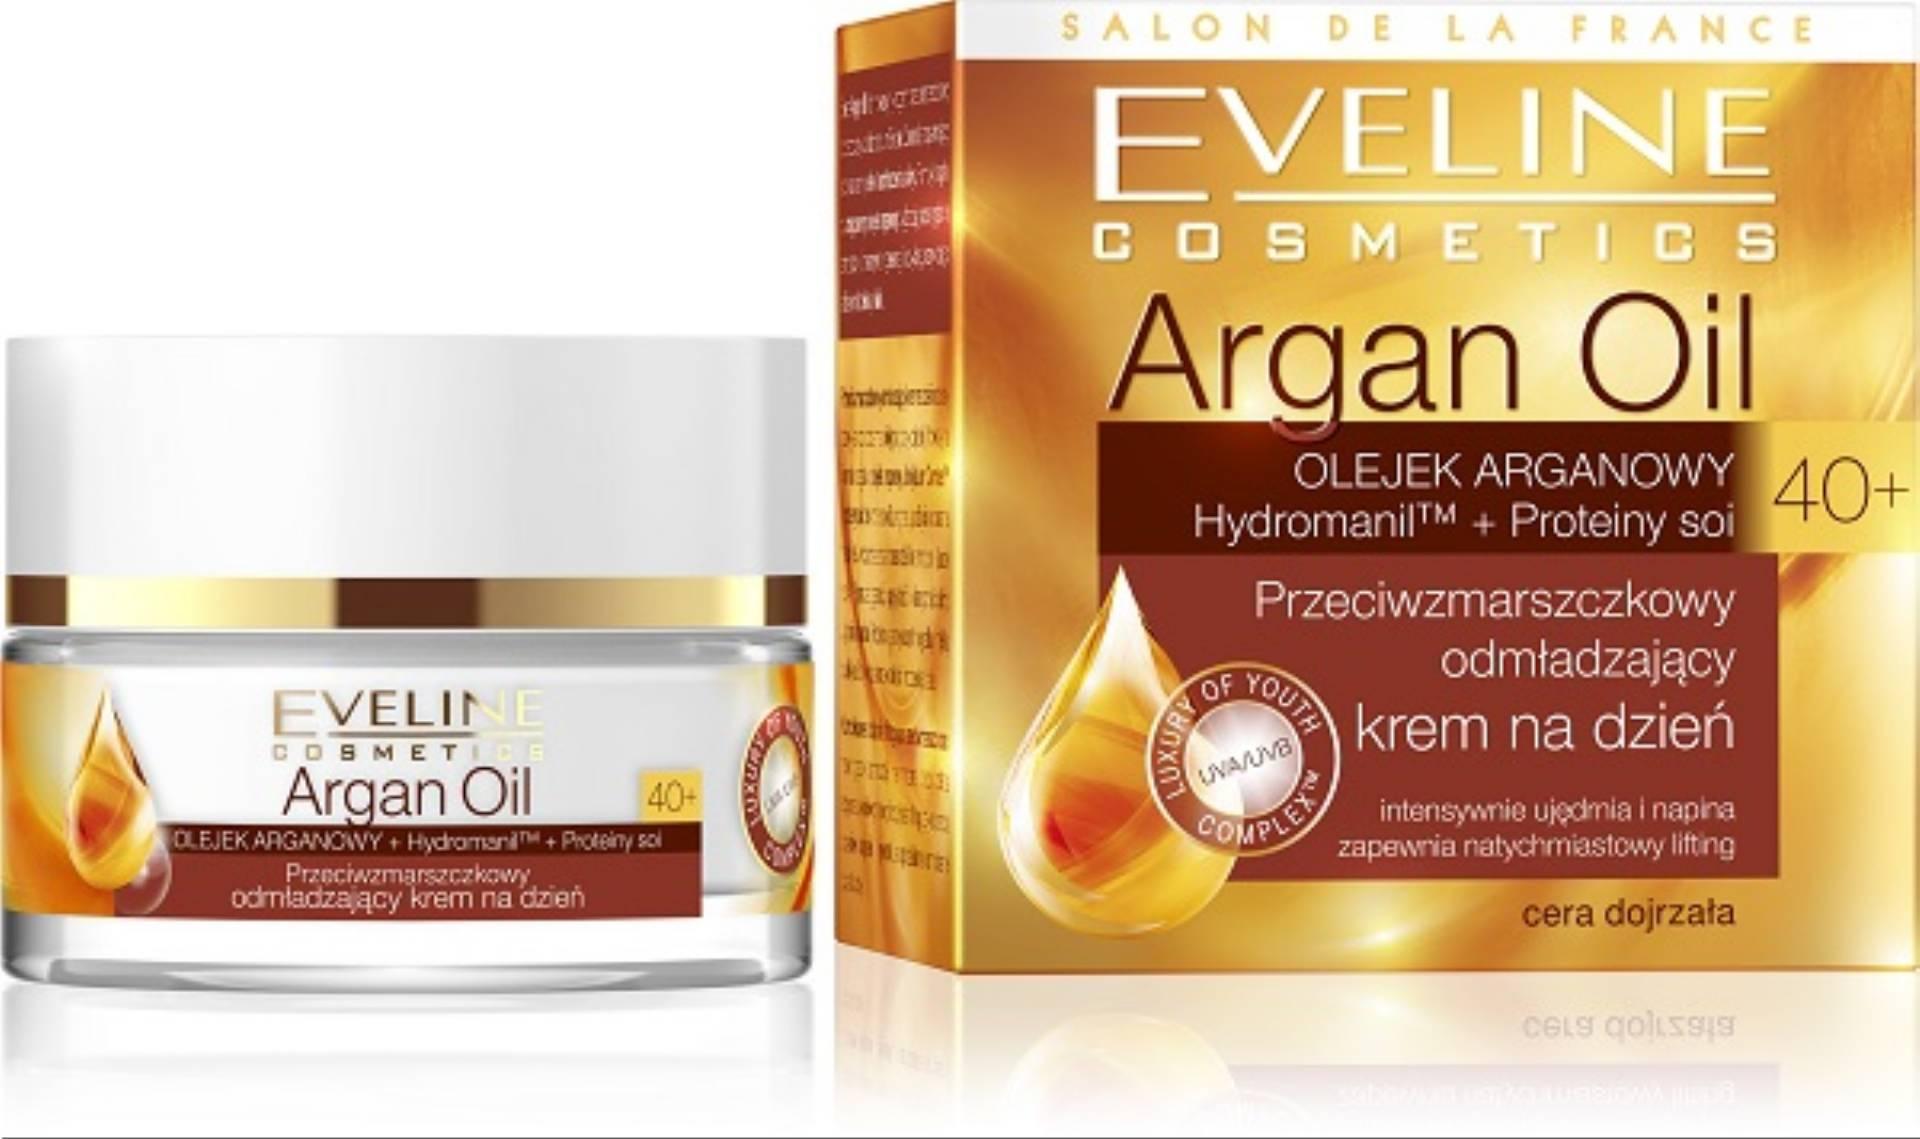 Eveline Cosmetics Argan Oil 40+ - krem na dzien